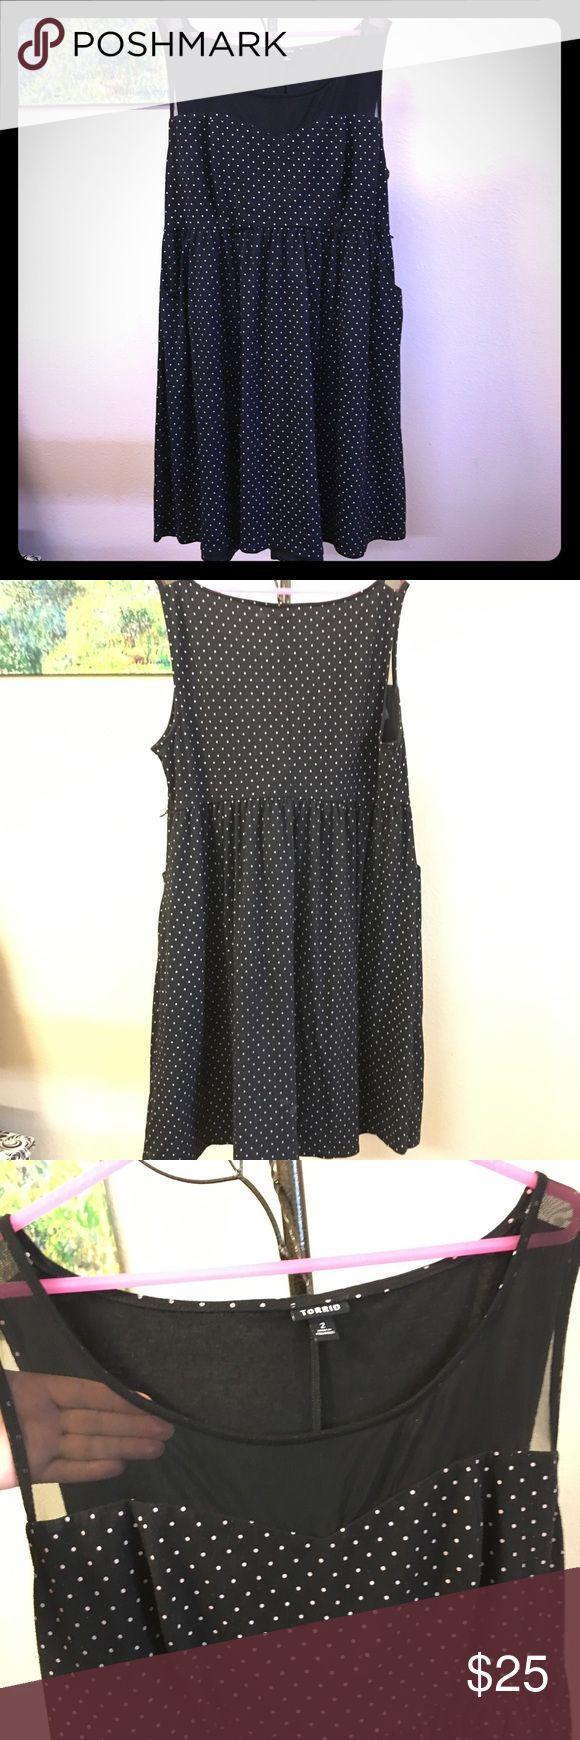 Black and white polka dot illusion dress